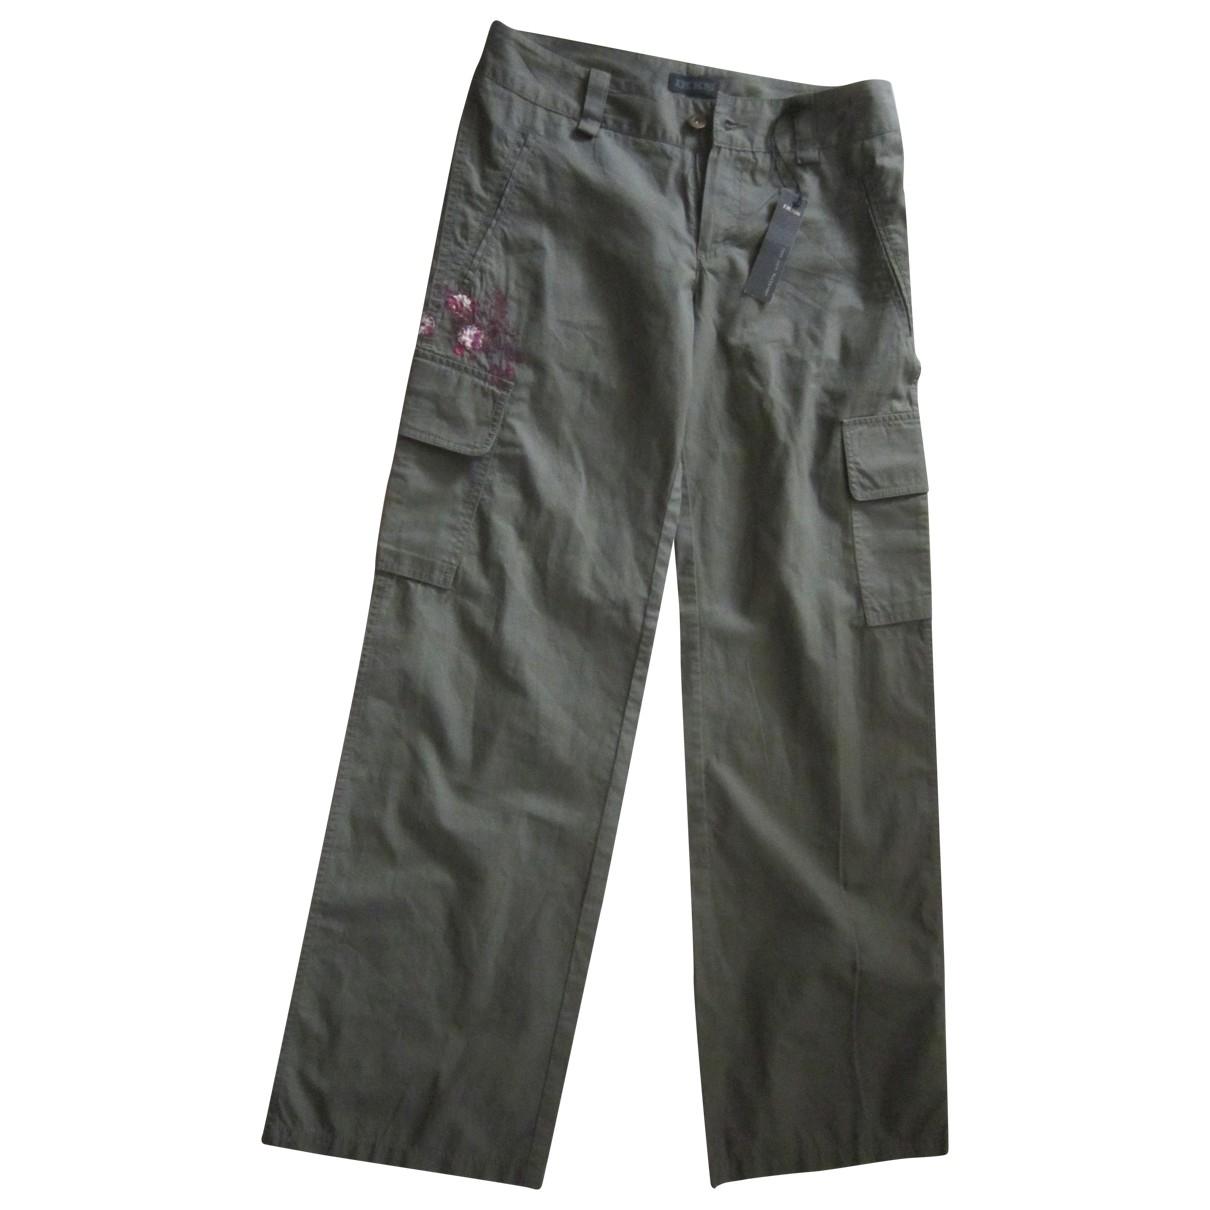 Ikks \N Green Cotton Trousers for Women 38 FR